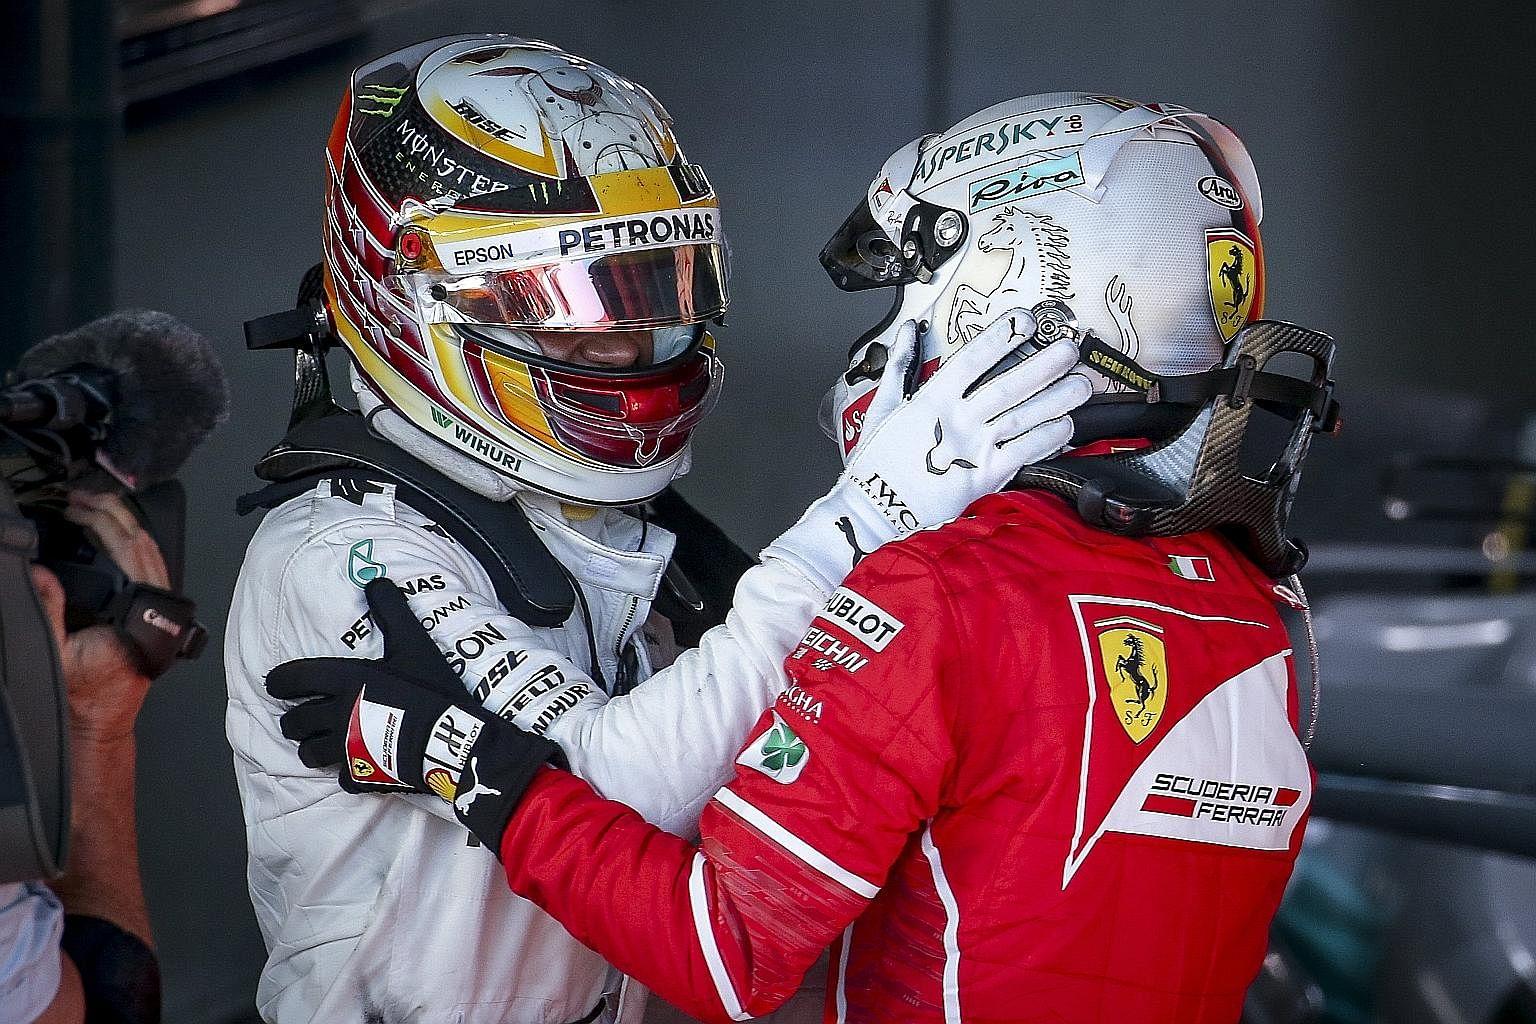 Mercedes' Lewis Hamilton (left) congratulating Sebastian Vettel after the Ferrari driver beat him by nearly 10 seconds.